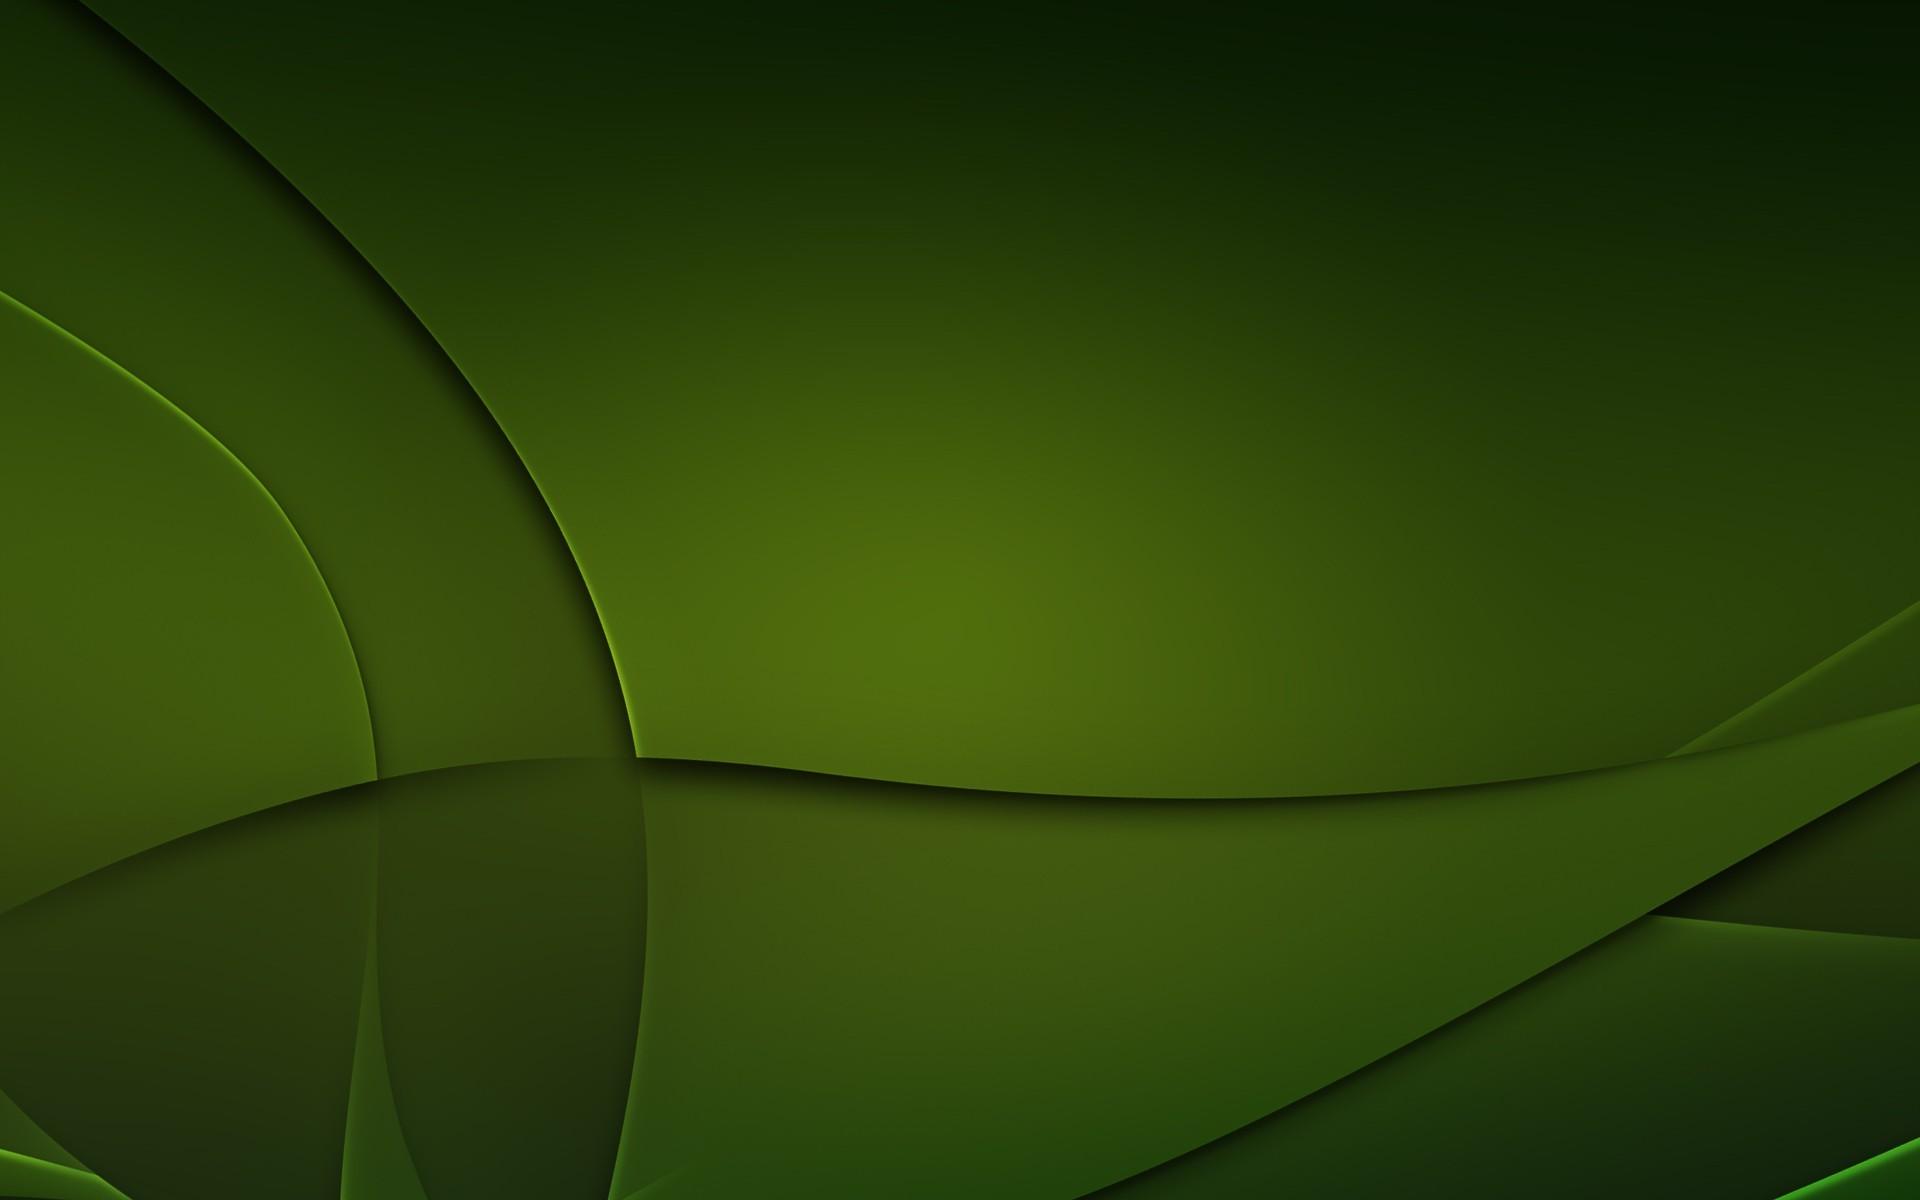 Free green wallpaper background